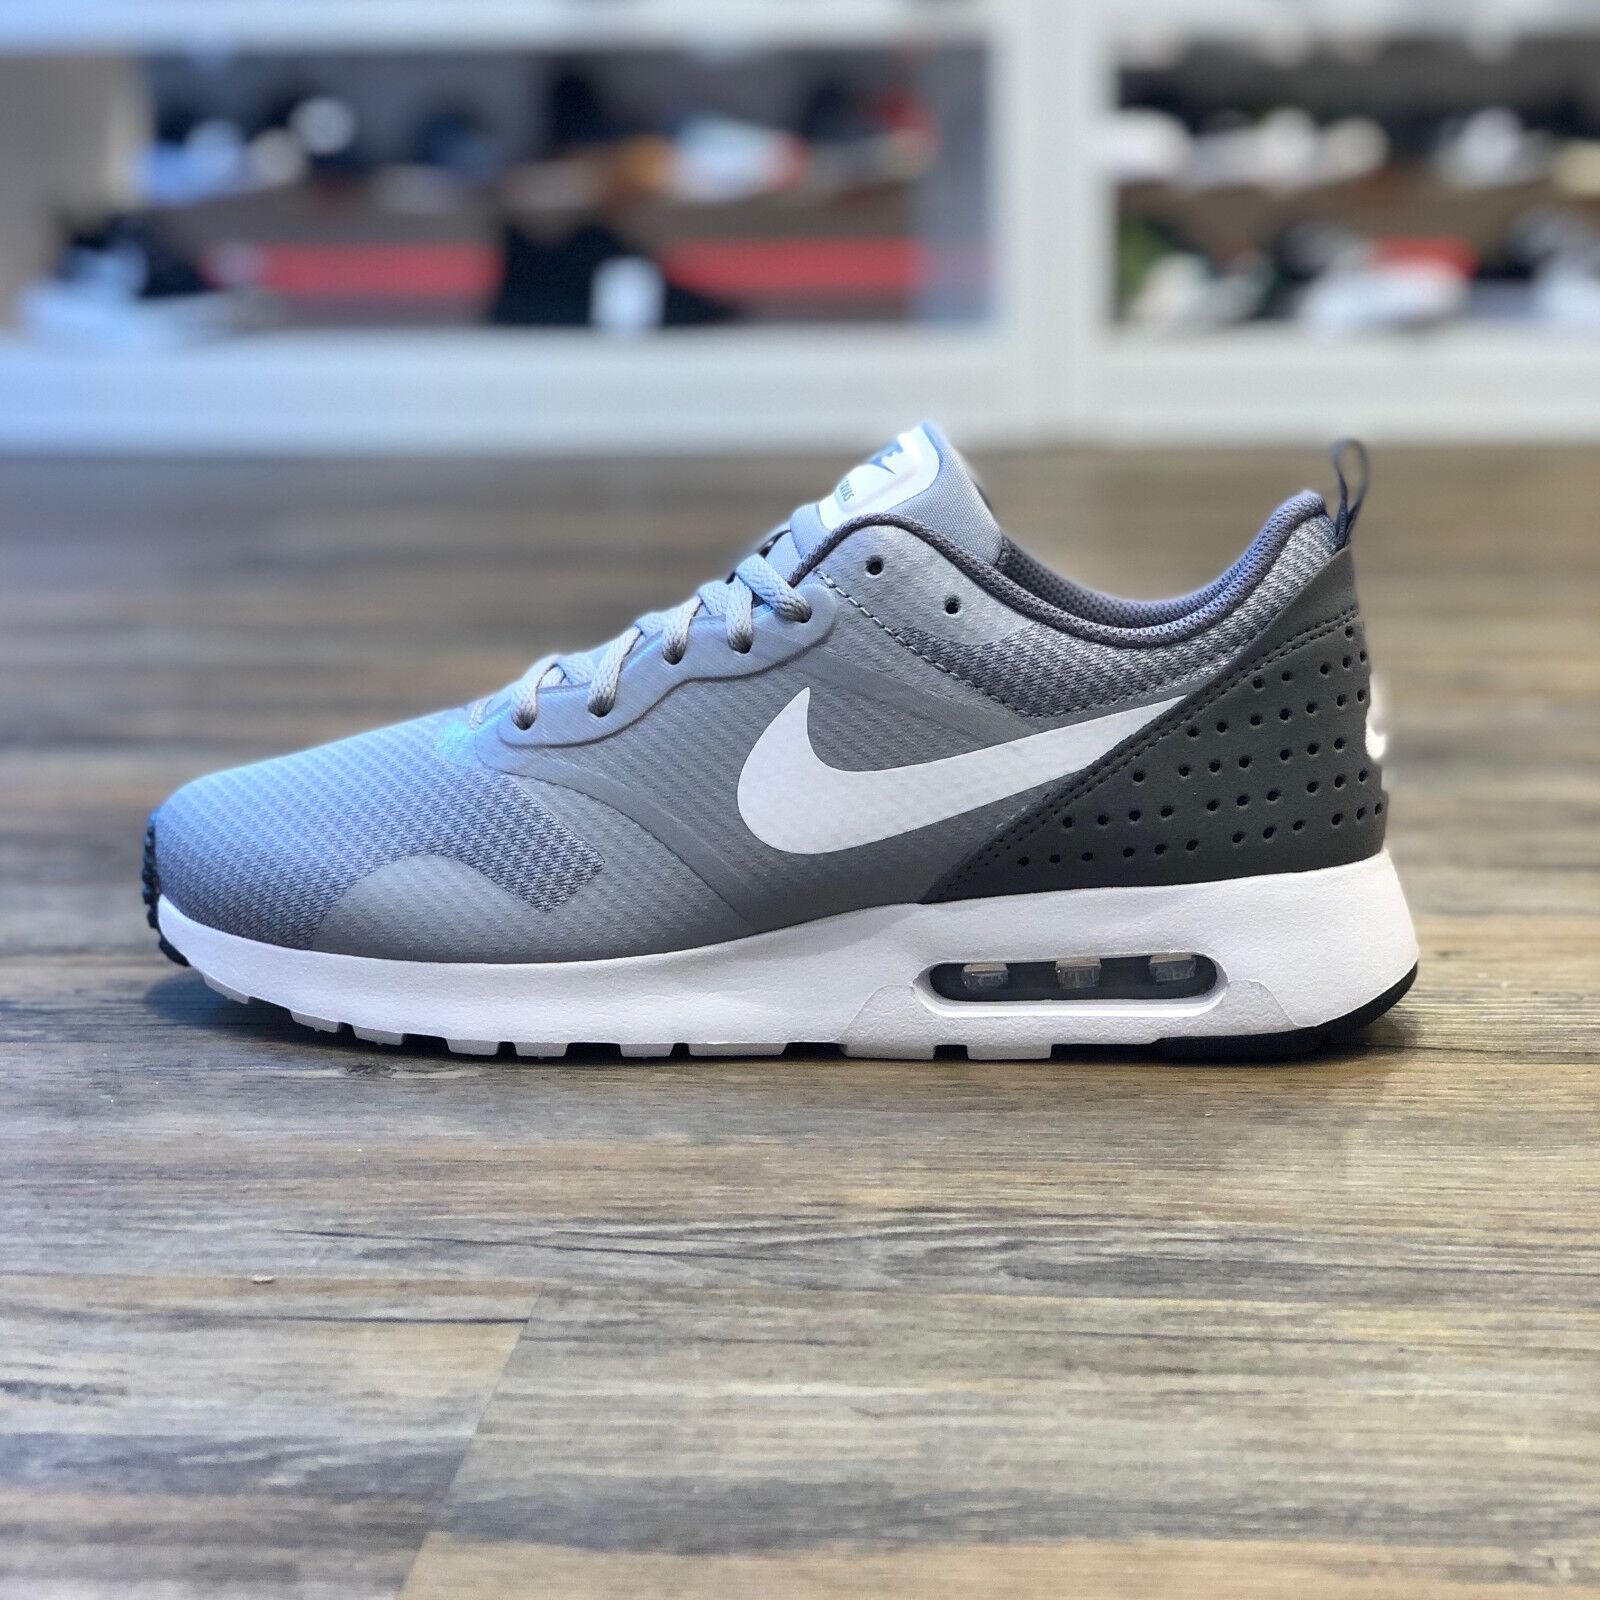 brand new 90bf5 0249c Nike Air Max Tavas Tavas Tavas taille 41 Chaussures Sneaker Gris Turn Sport  Homme Nouveau 705149 007 61007d